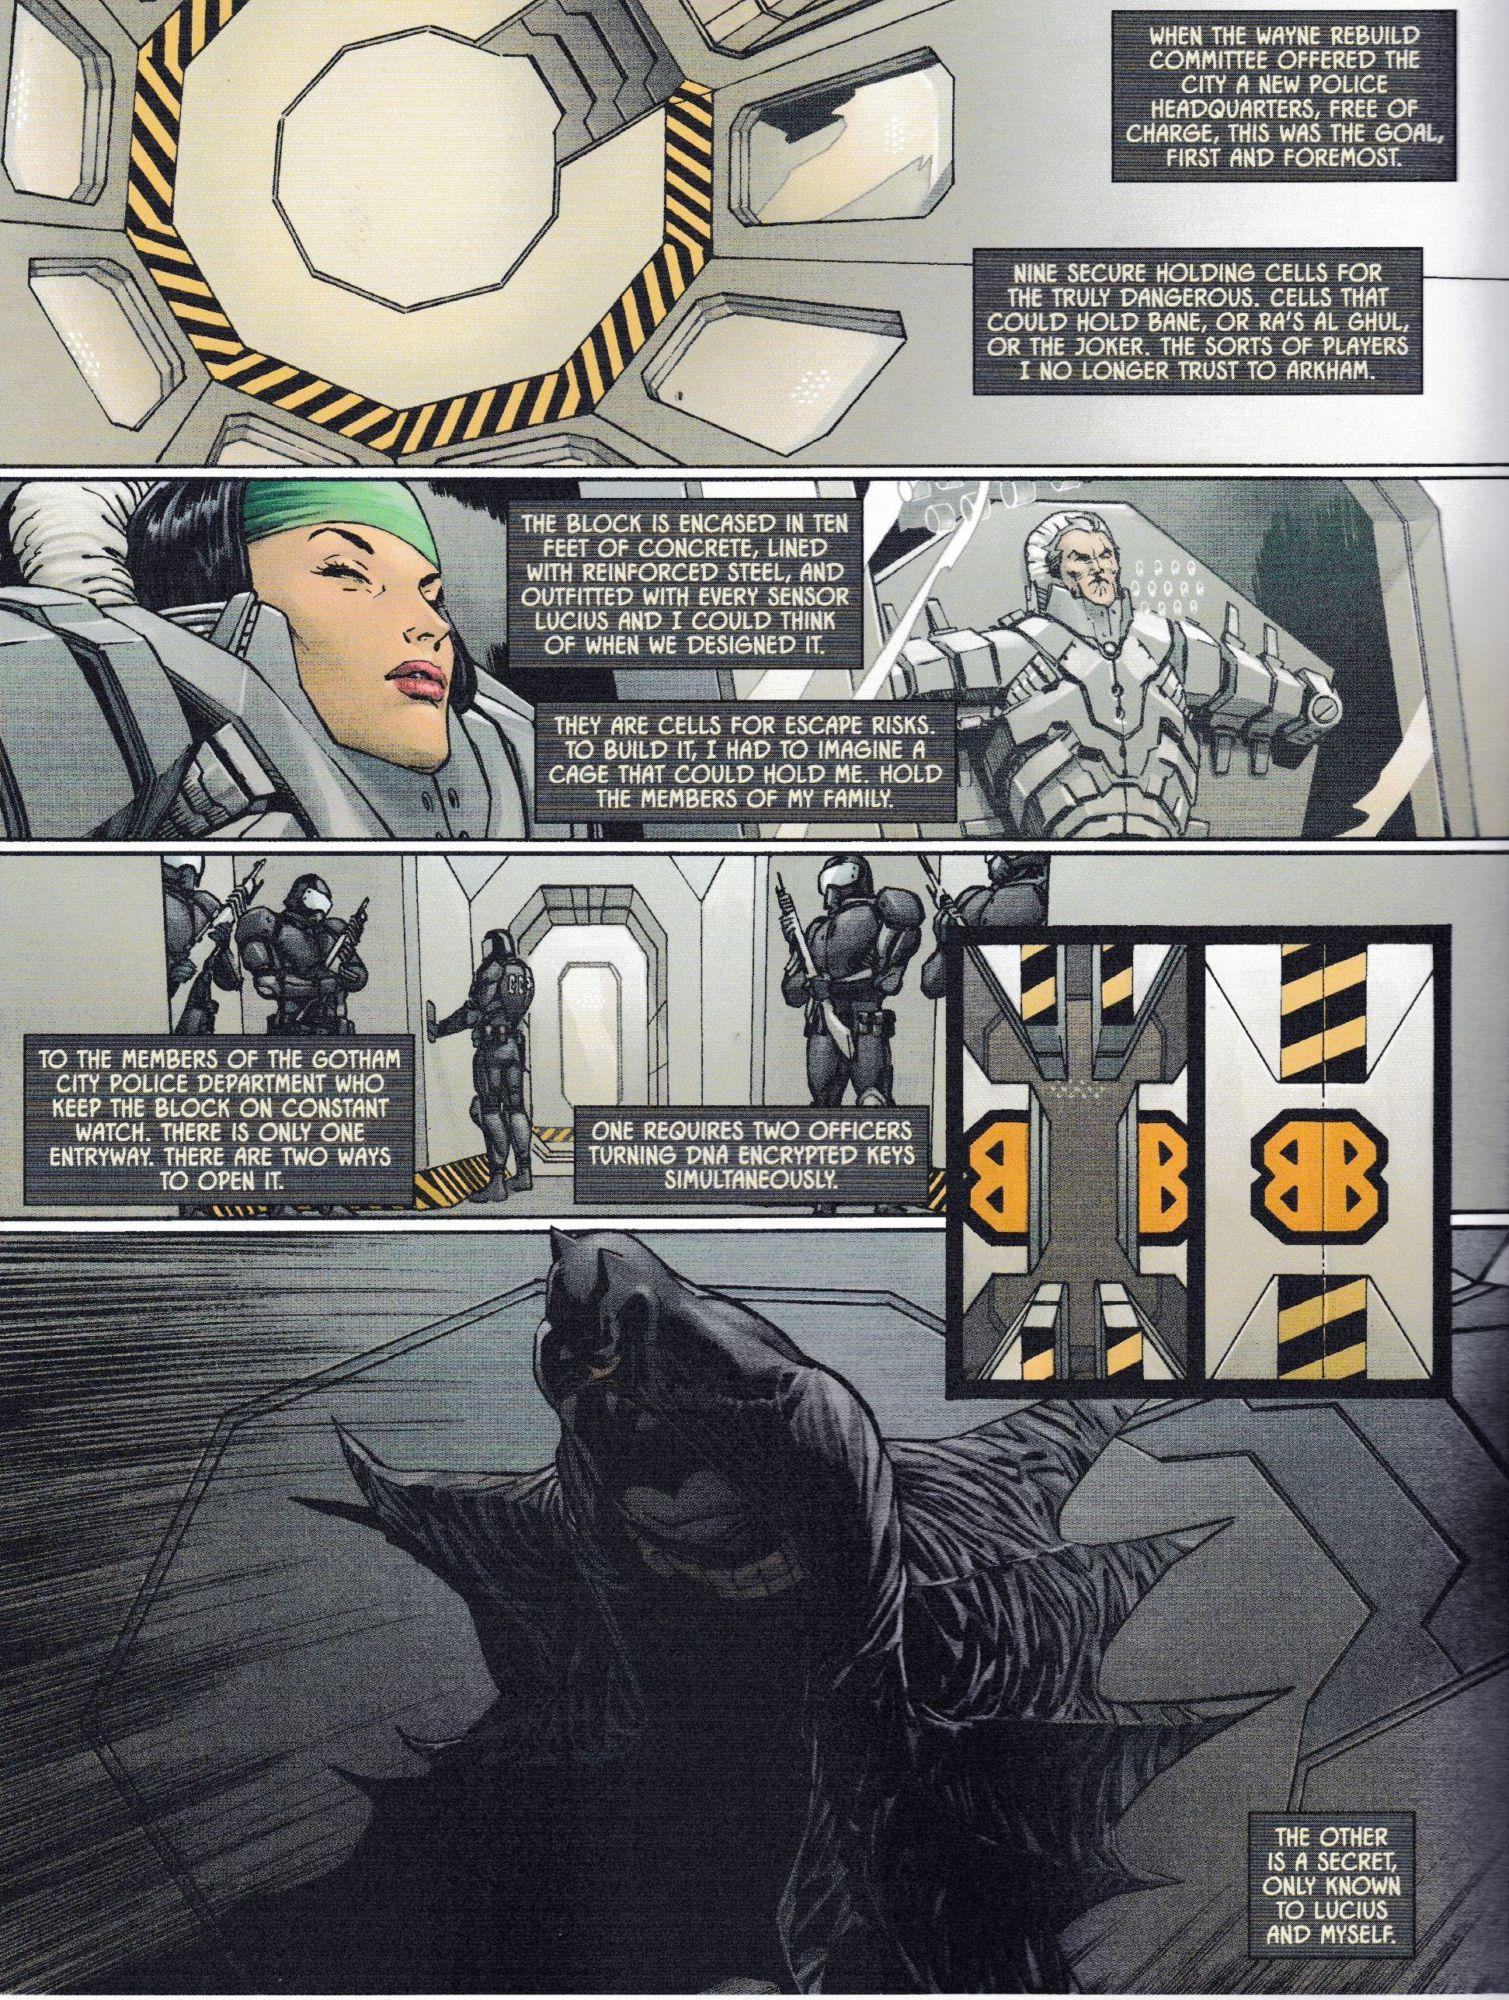 How Bruce Wayne is Rebuilding Gotham in Batman #87 and Batman/Superman #5